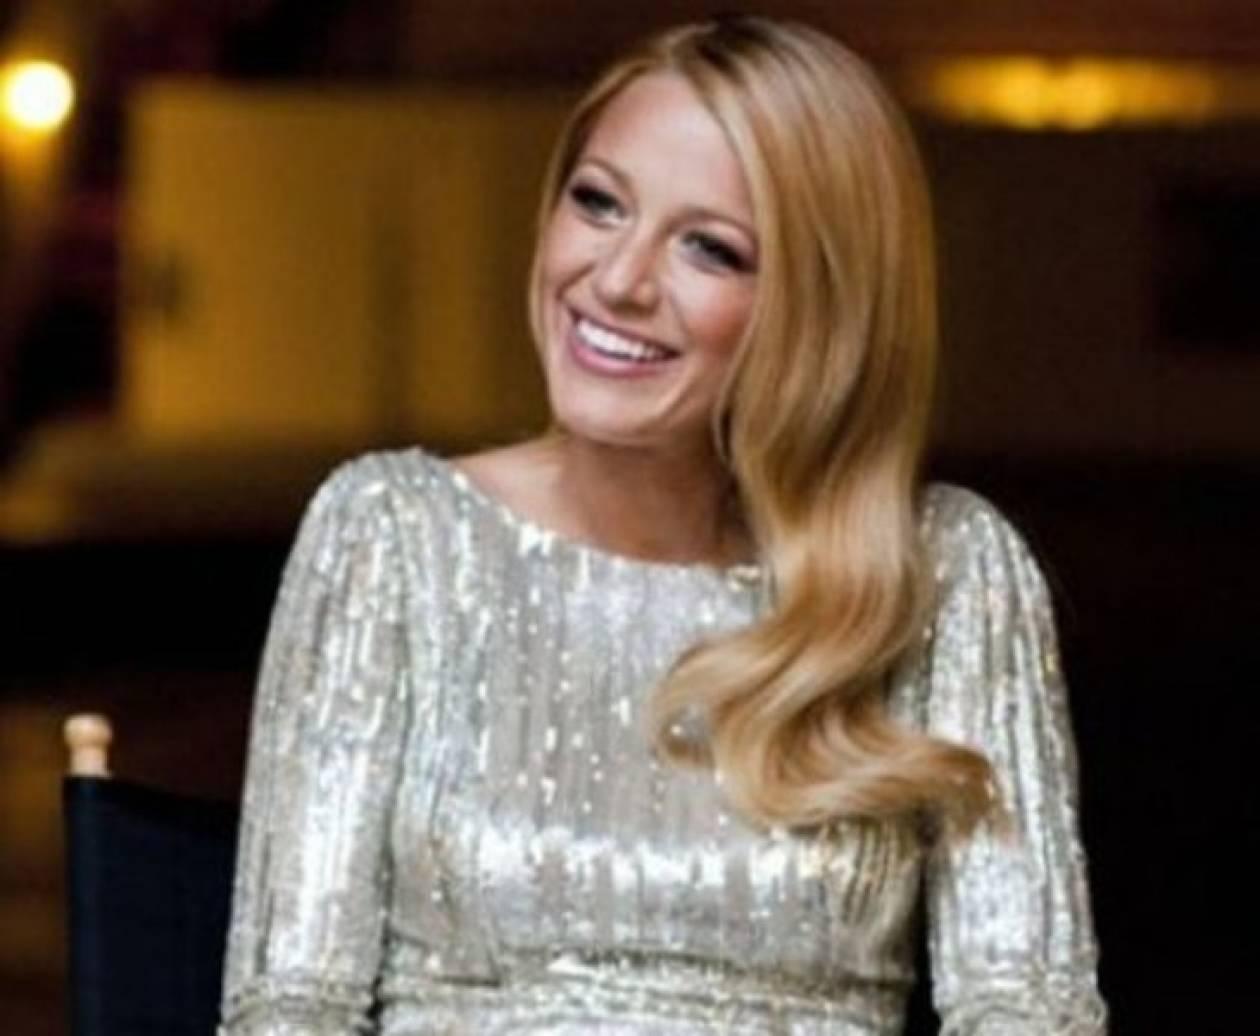 Blake Lively: Πώς θα περάσει τα πρώτα της Χριστούγεννα ως παντρεμένη;